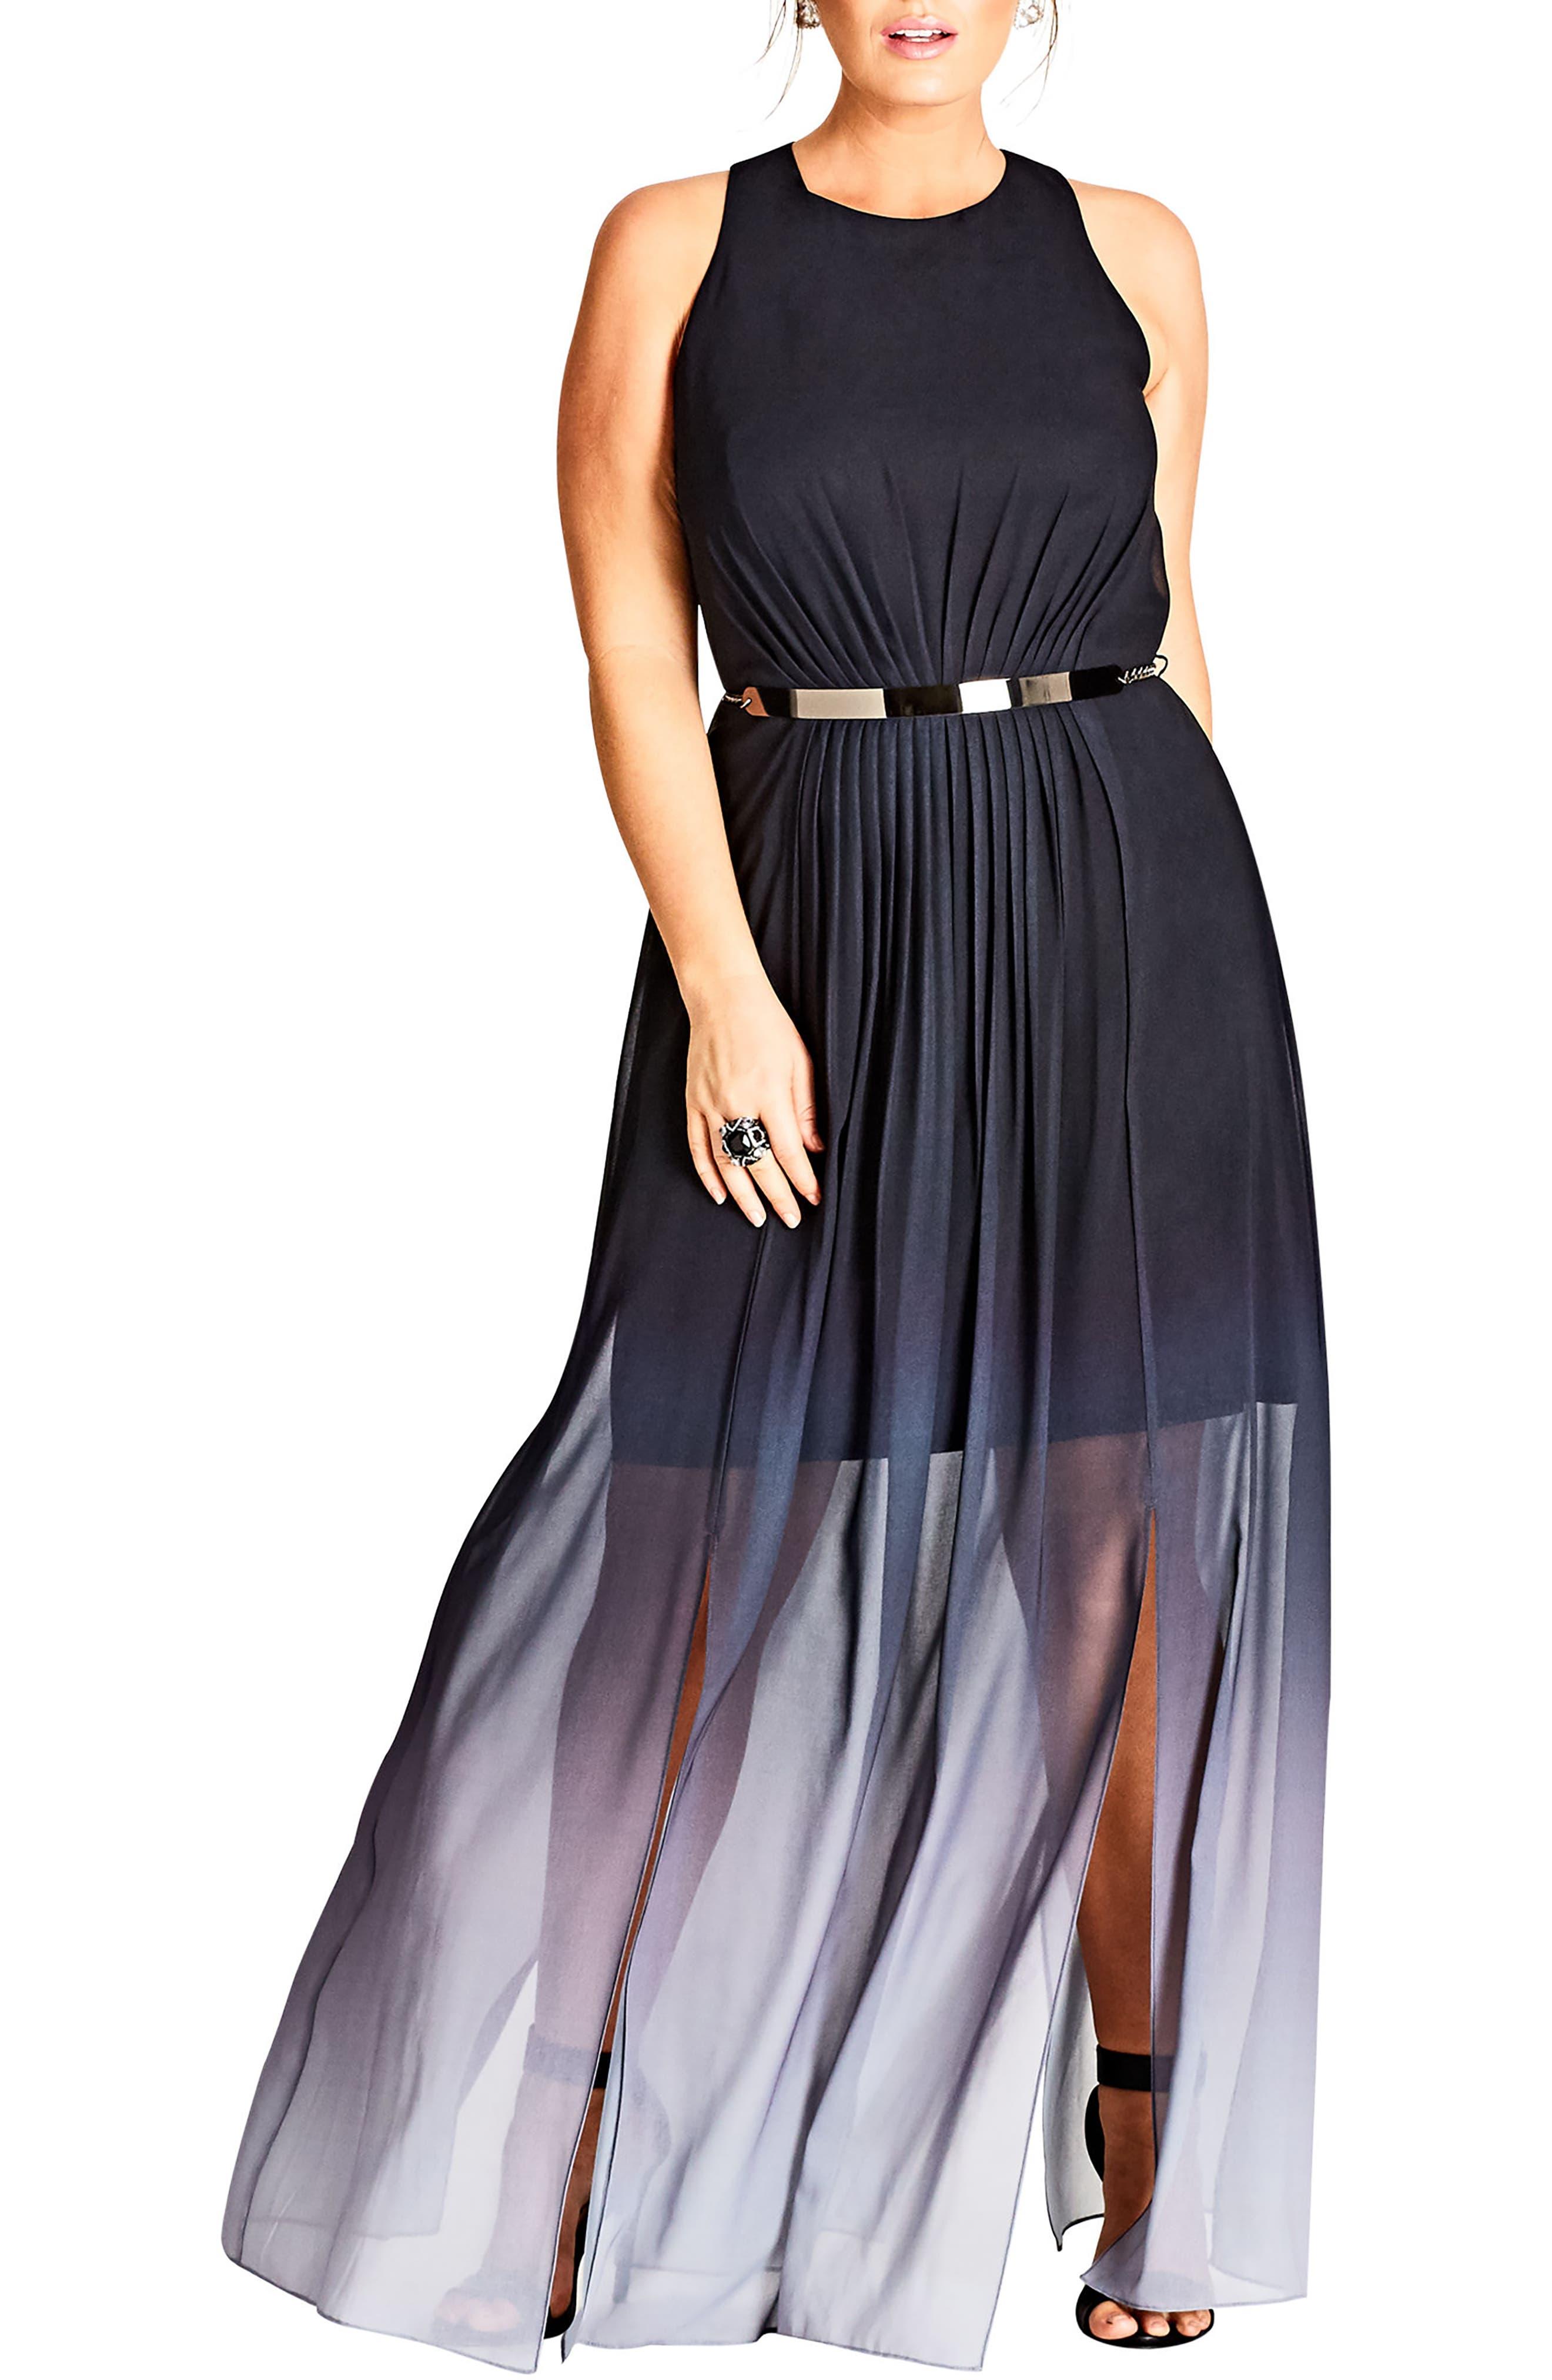 Alternate Image 1 Selected - City Chic Statement Ombré Maxi Dress (Plus Size)